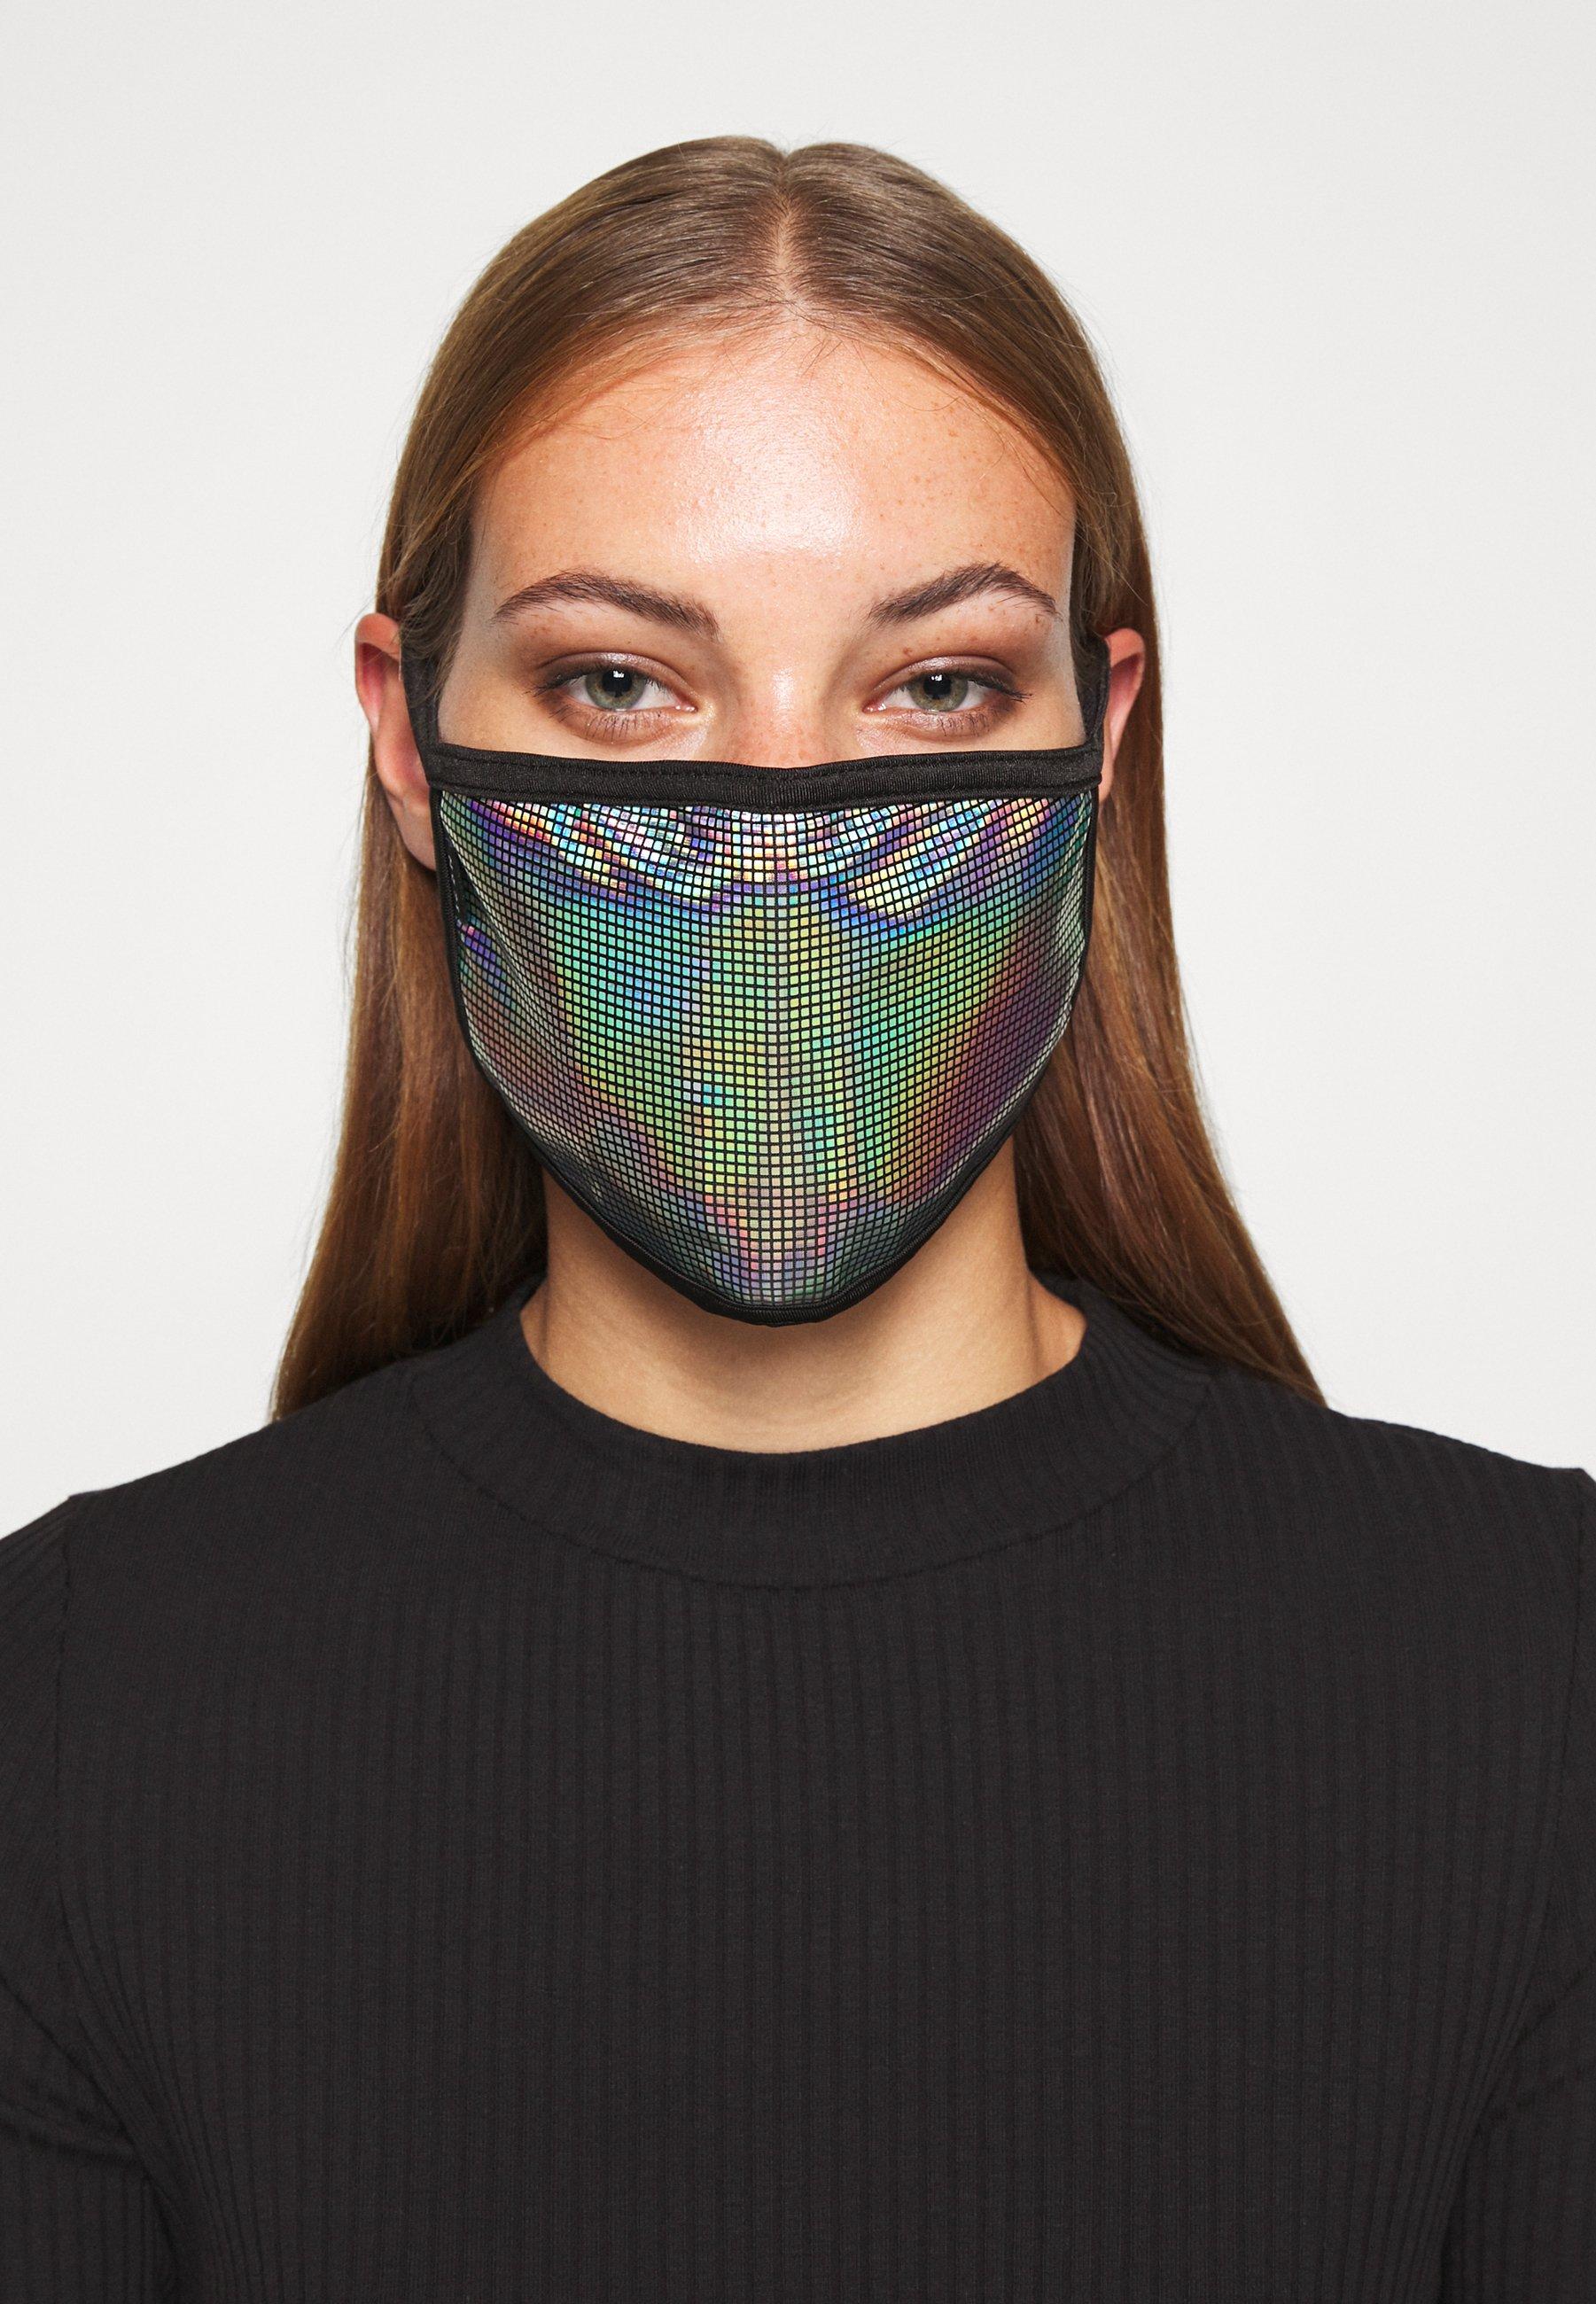 Men PATTERNED COMMUNITY MASK - Community mask